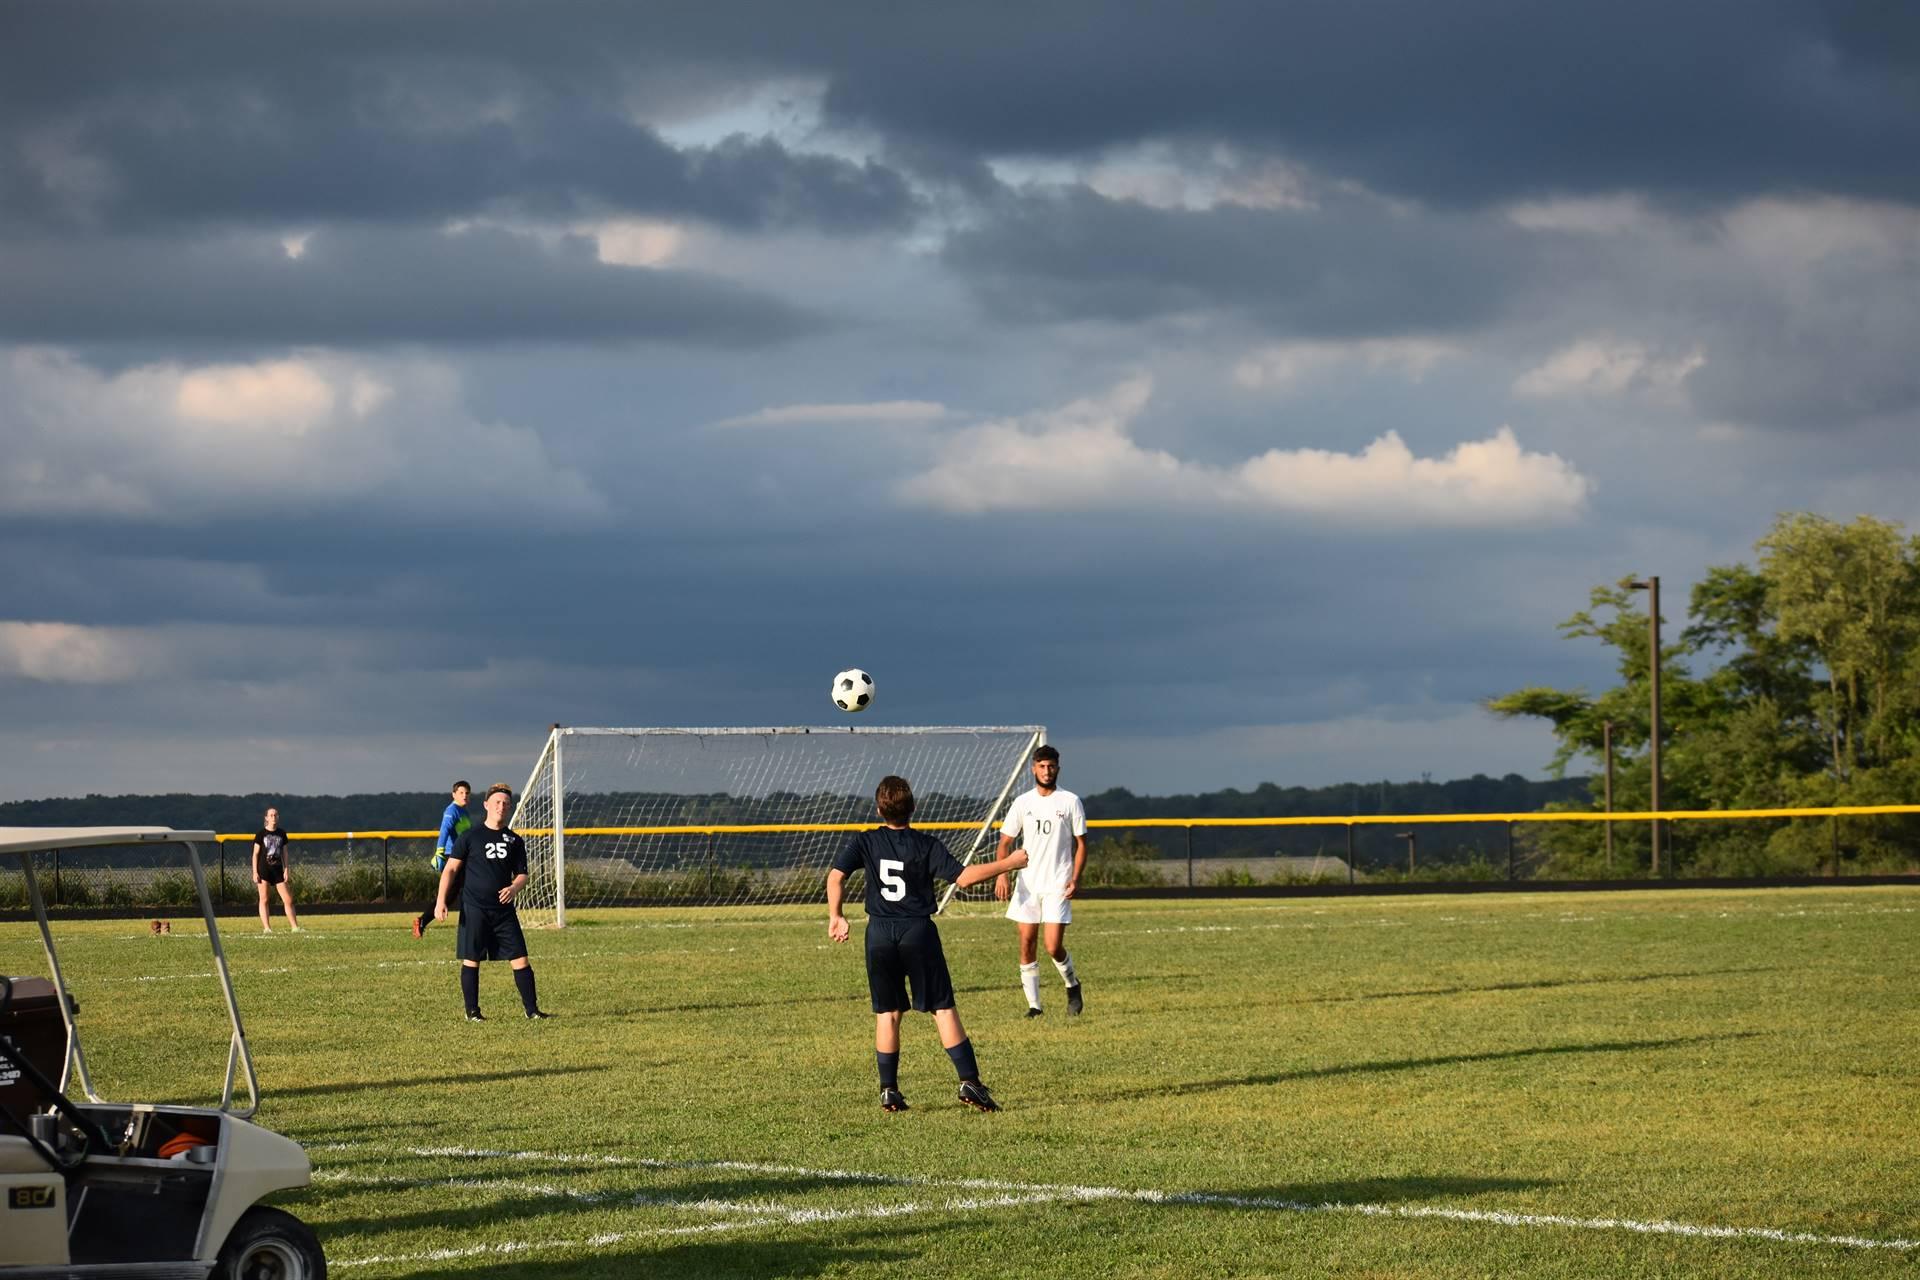 The varsity boys soccer team in action